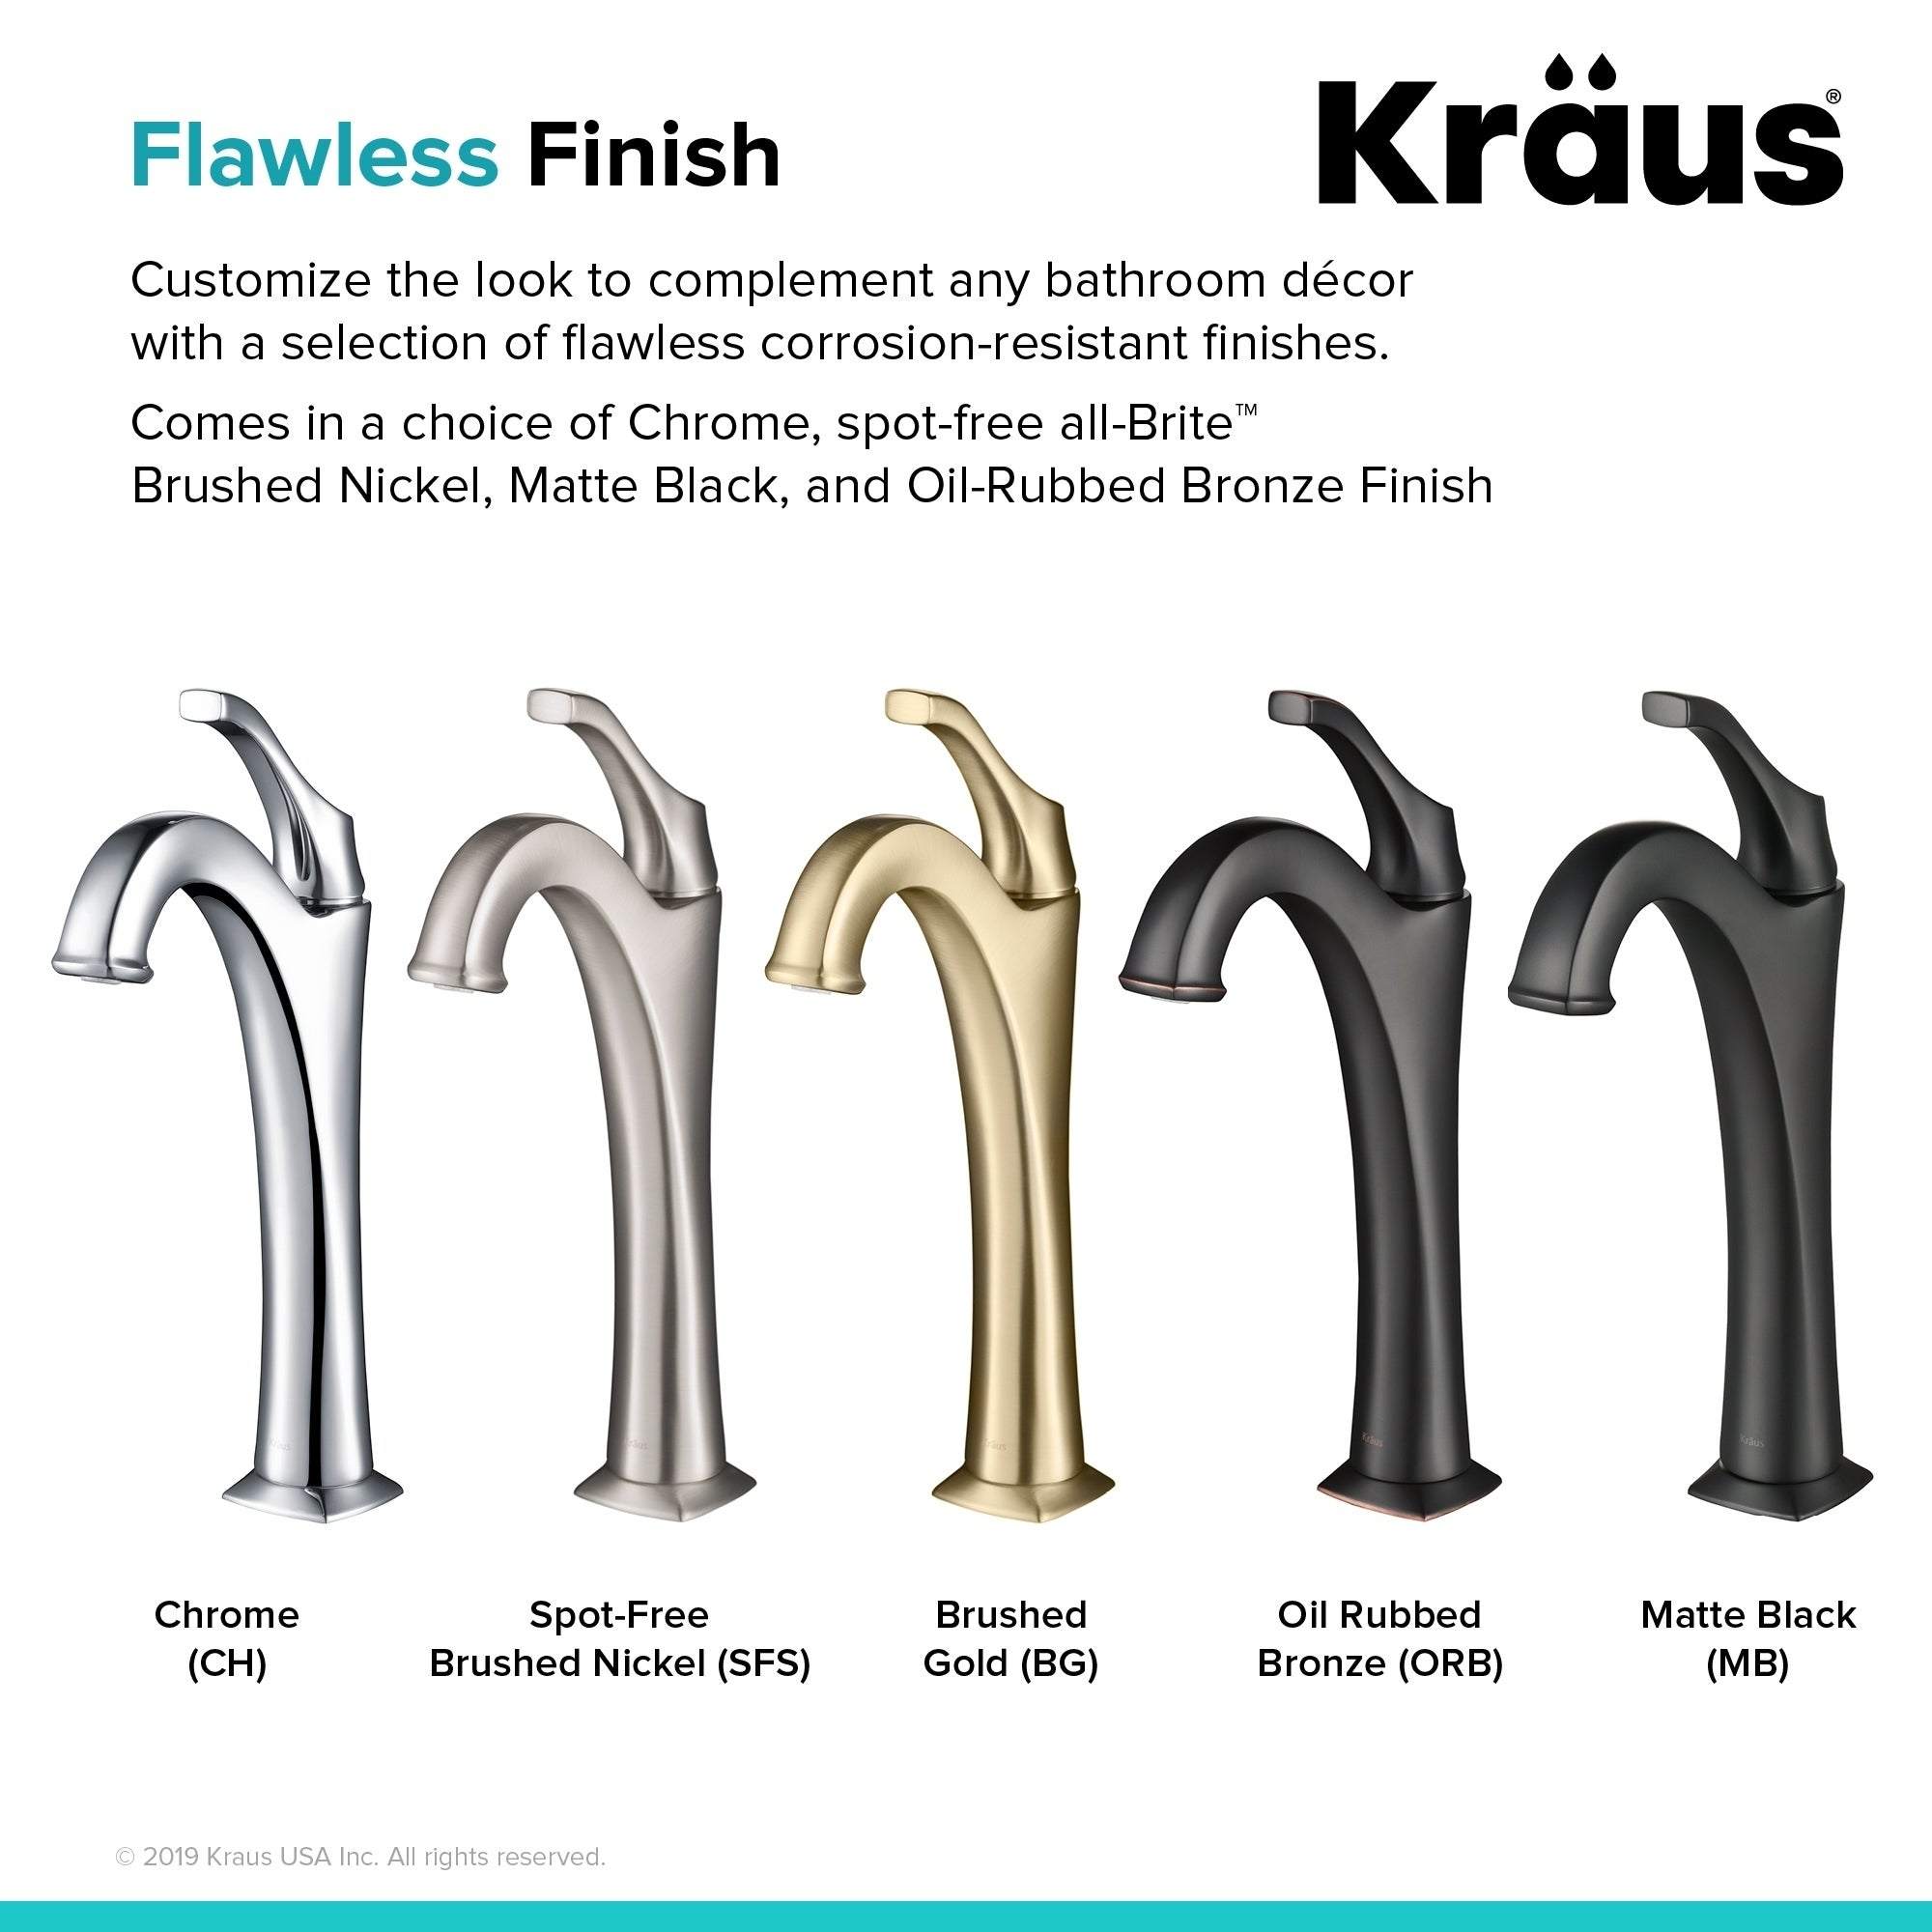 Kraus KVF-1200 Arlo Single Hole 1-Handle Bathroom Vessel Faucet, Drain